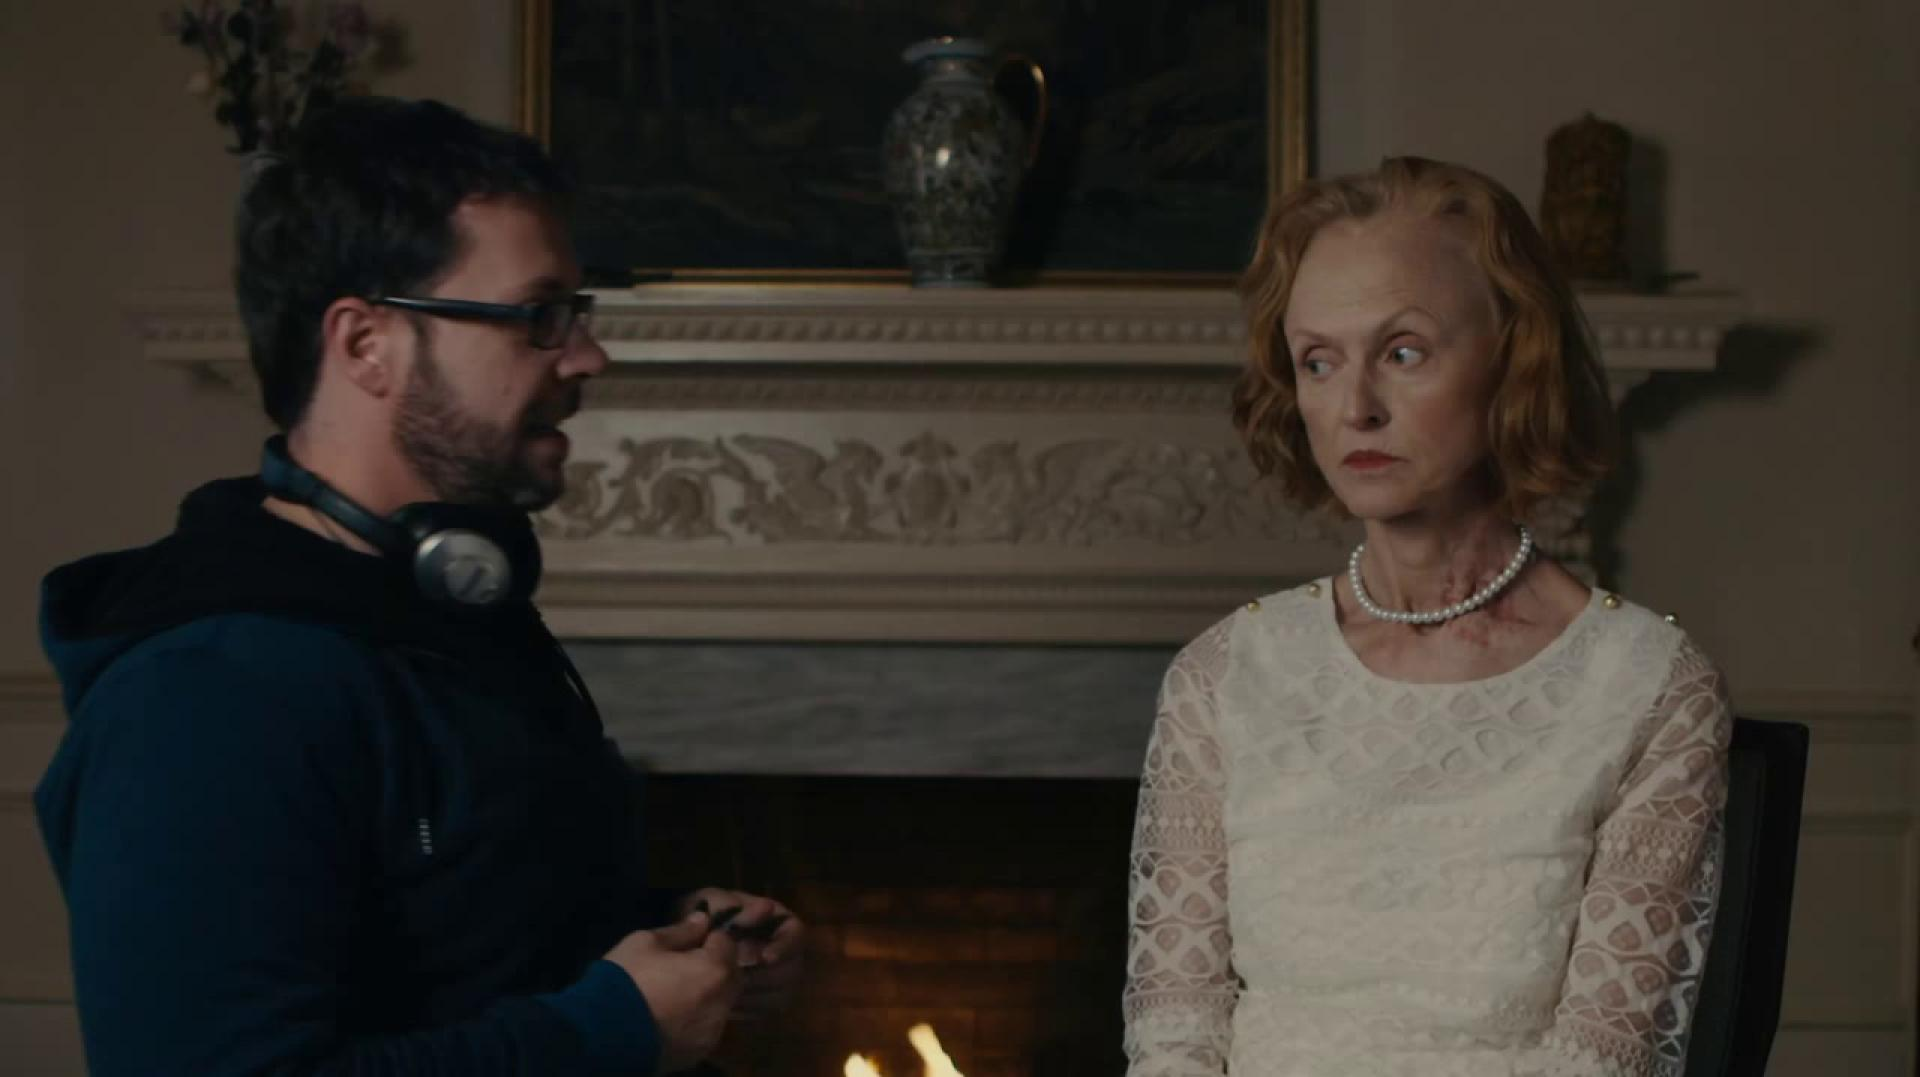 The Taking of Deborah Logan - Ördögűzés: Deborah Logan története (2014)